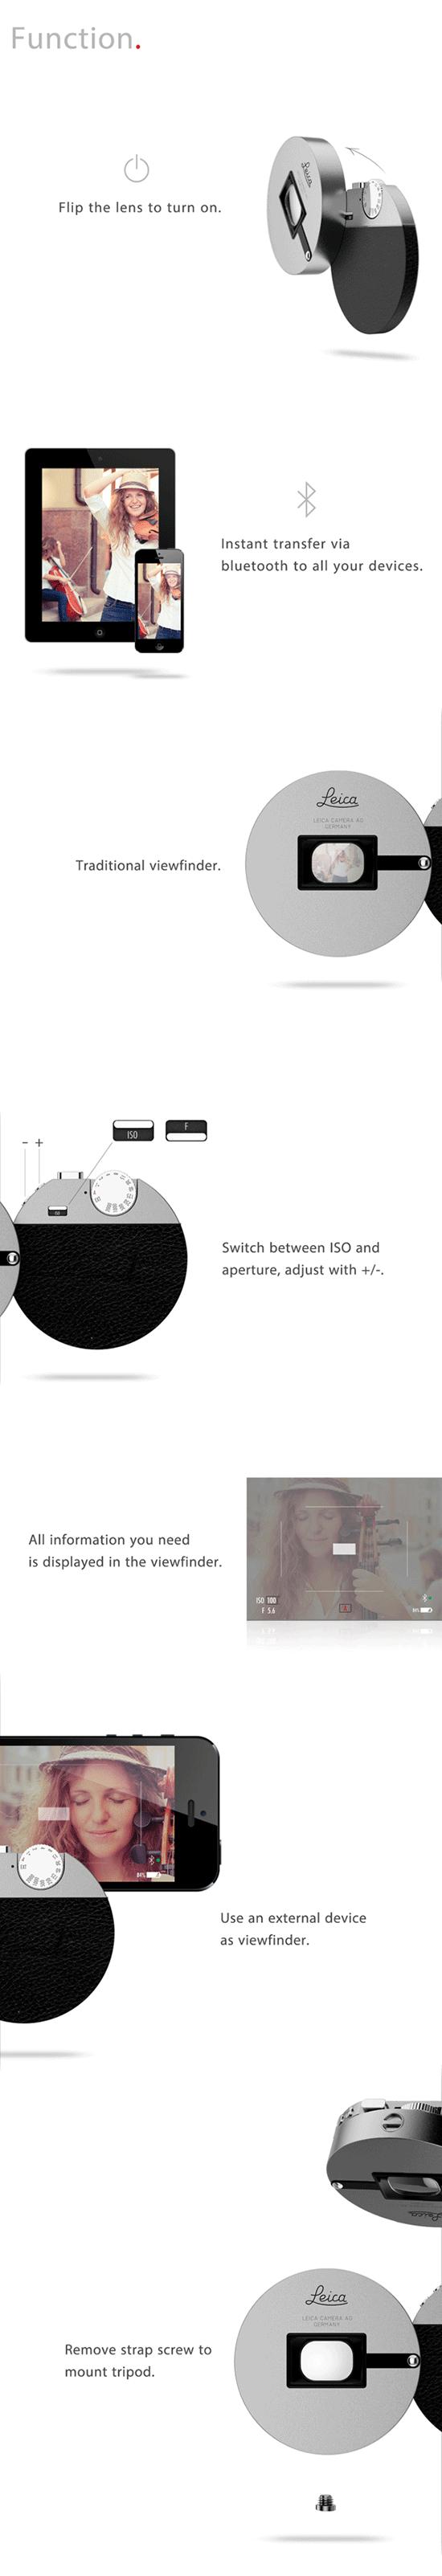 Leica-X3-concept-camera-(2)